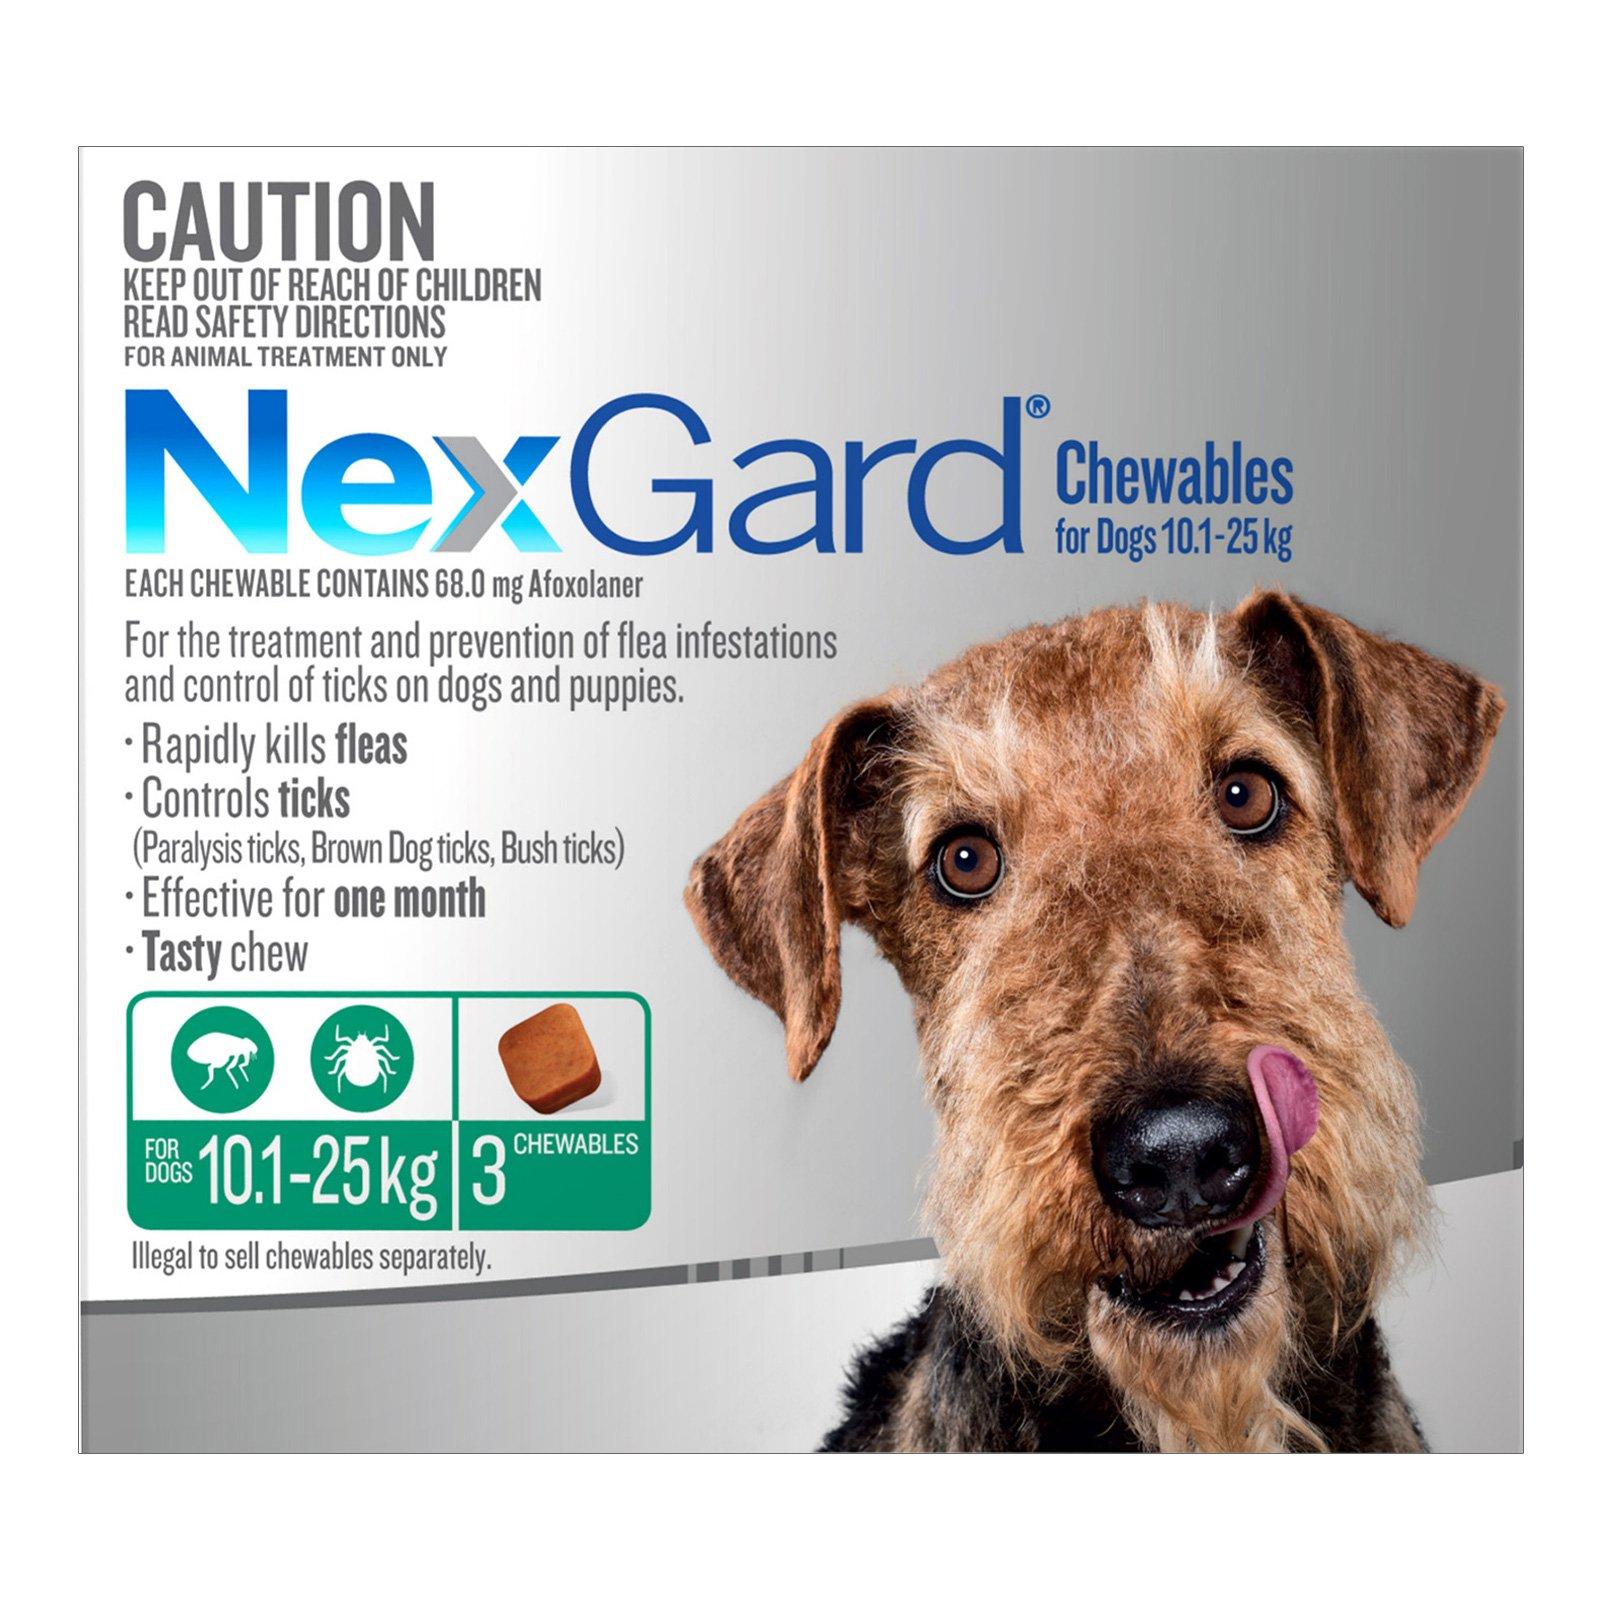 nexgard-chewables-for-dogs-10-1-25-kg_3.jpg